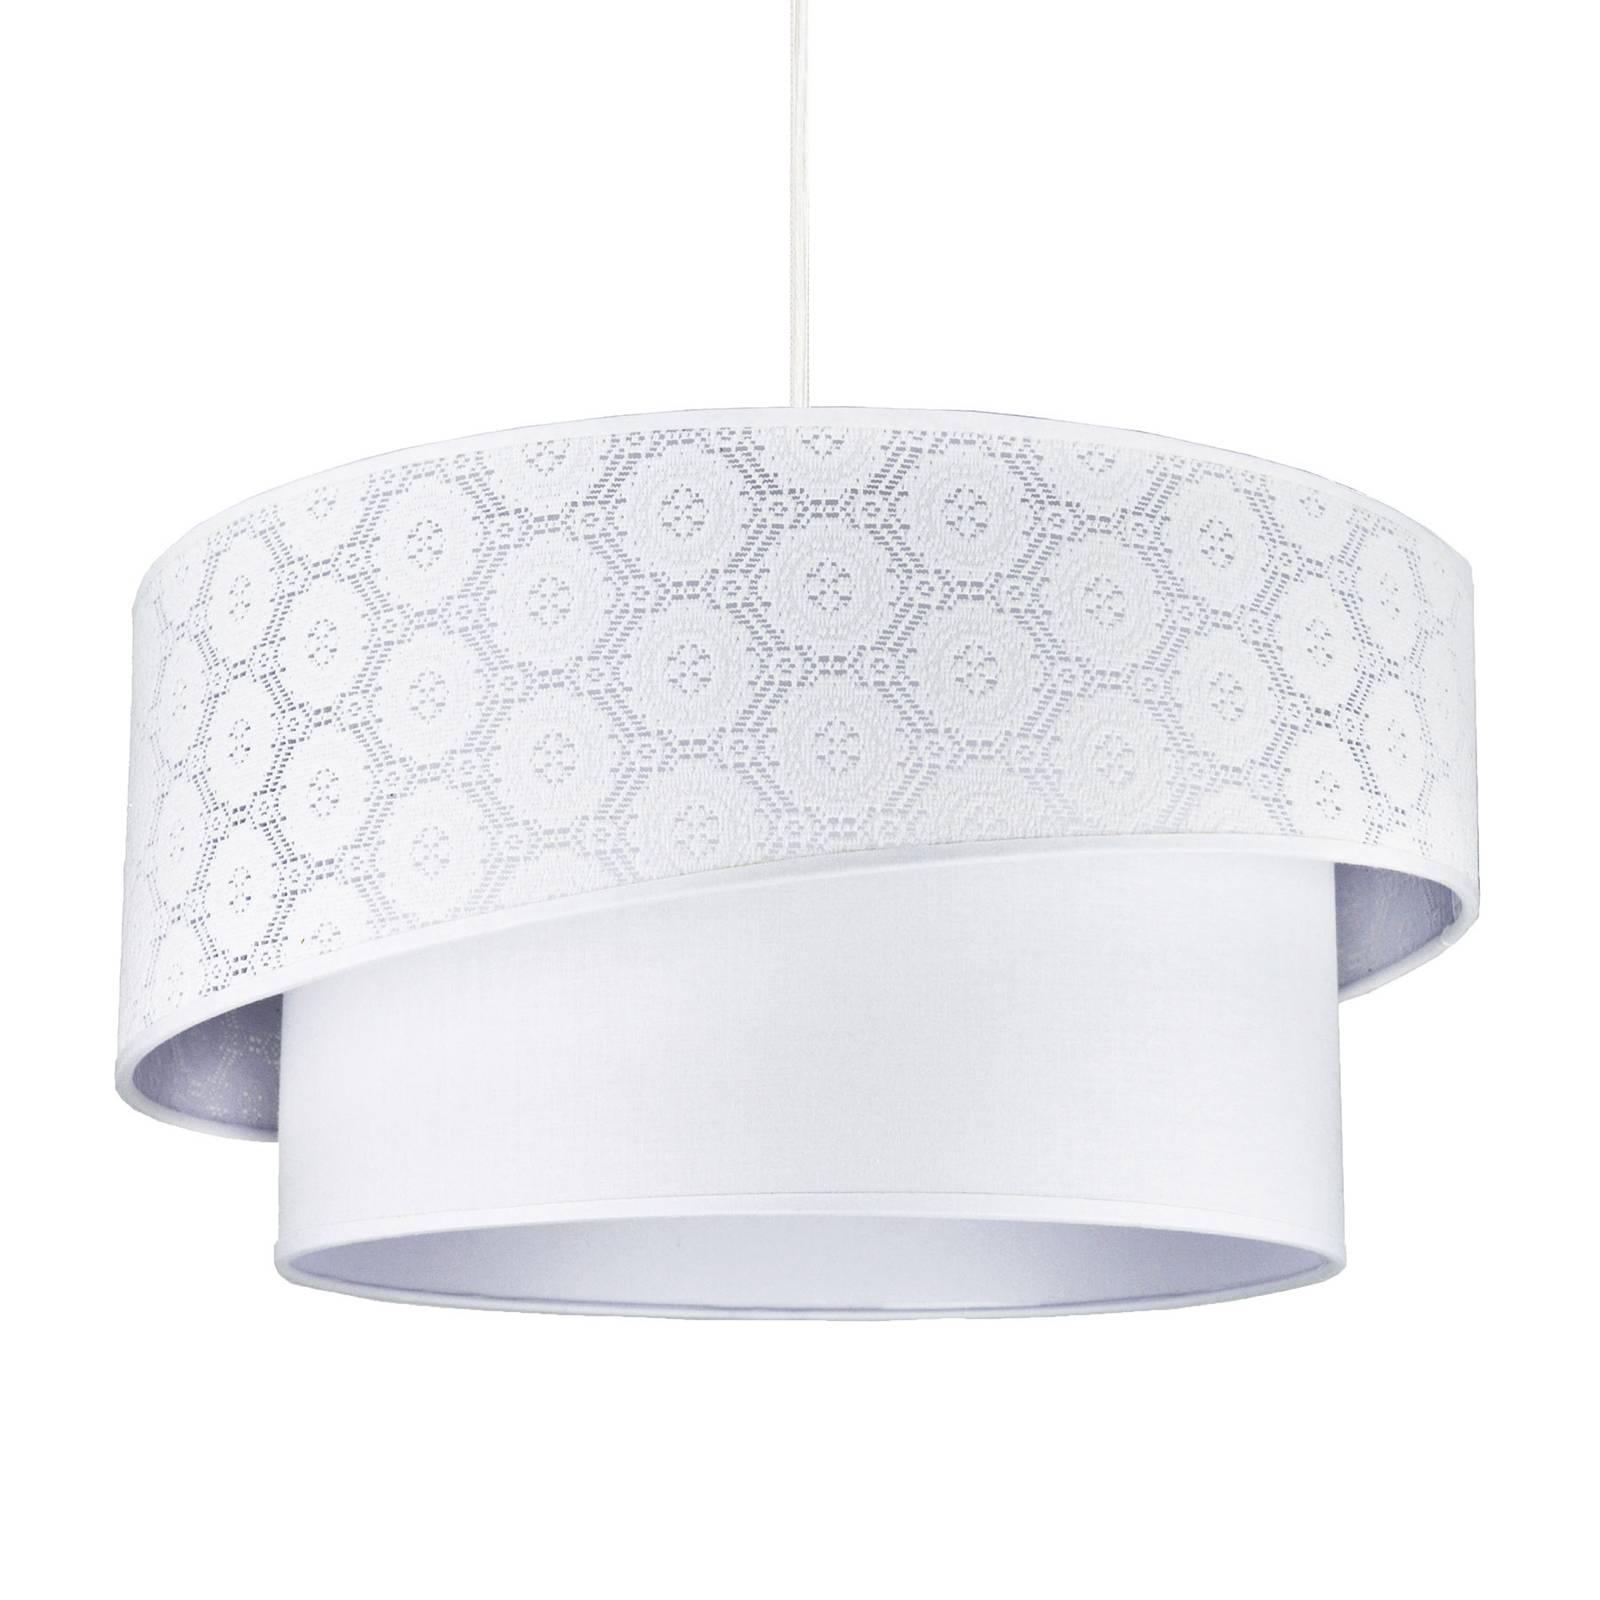 Hanglamp Shine, wit, met patroon